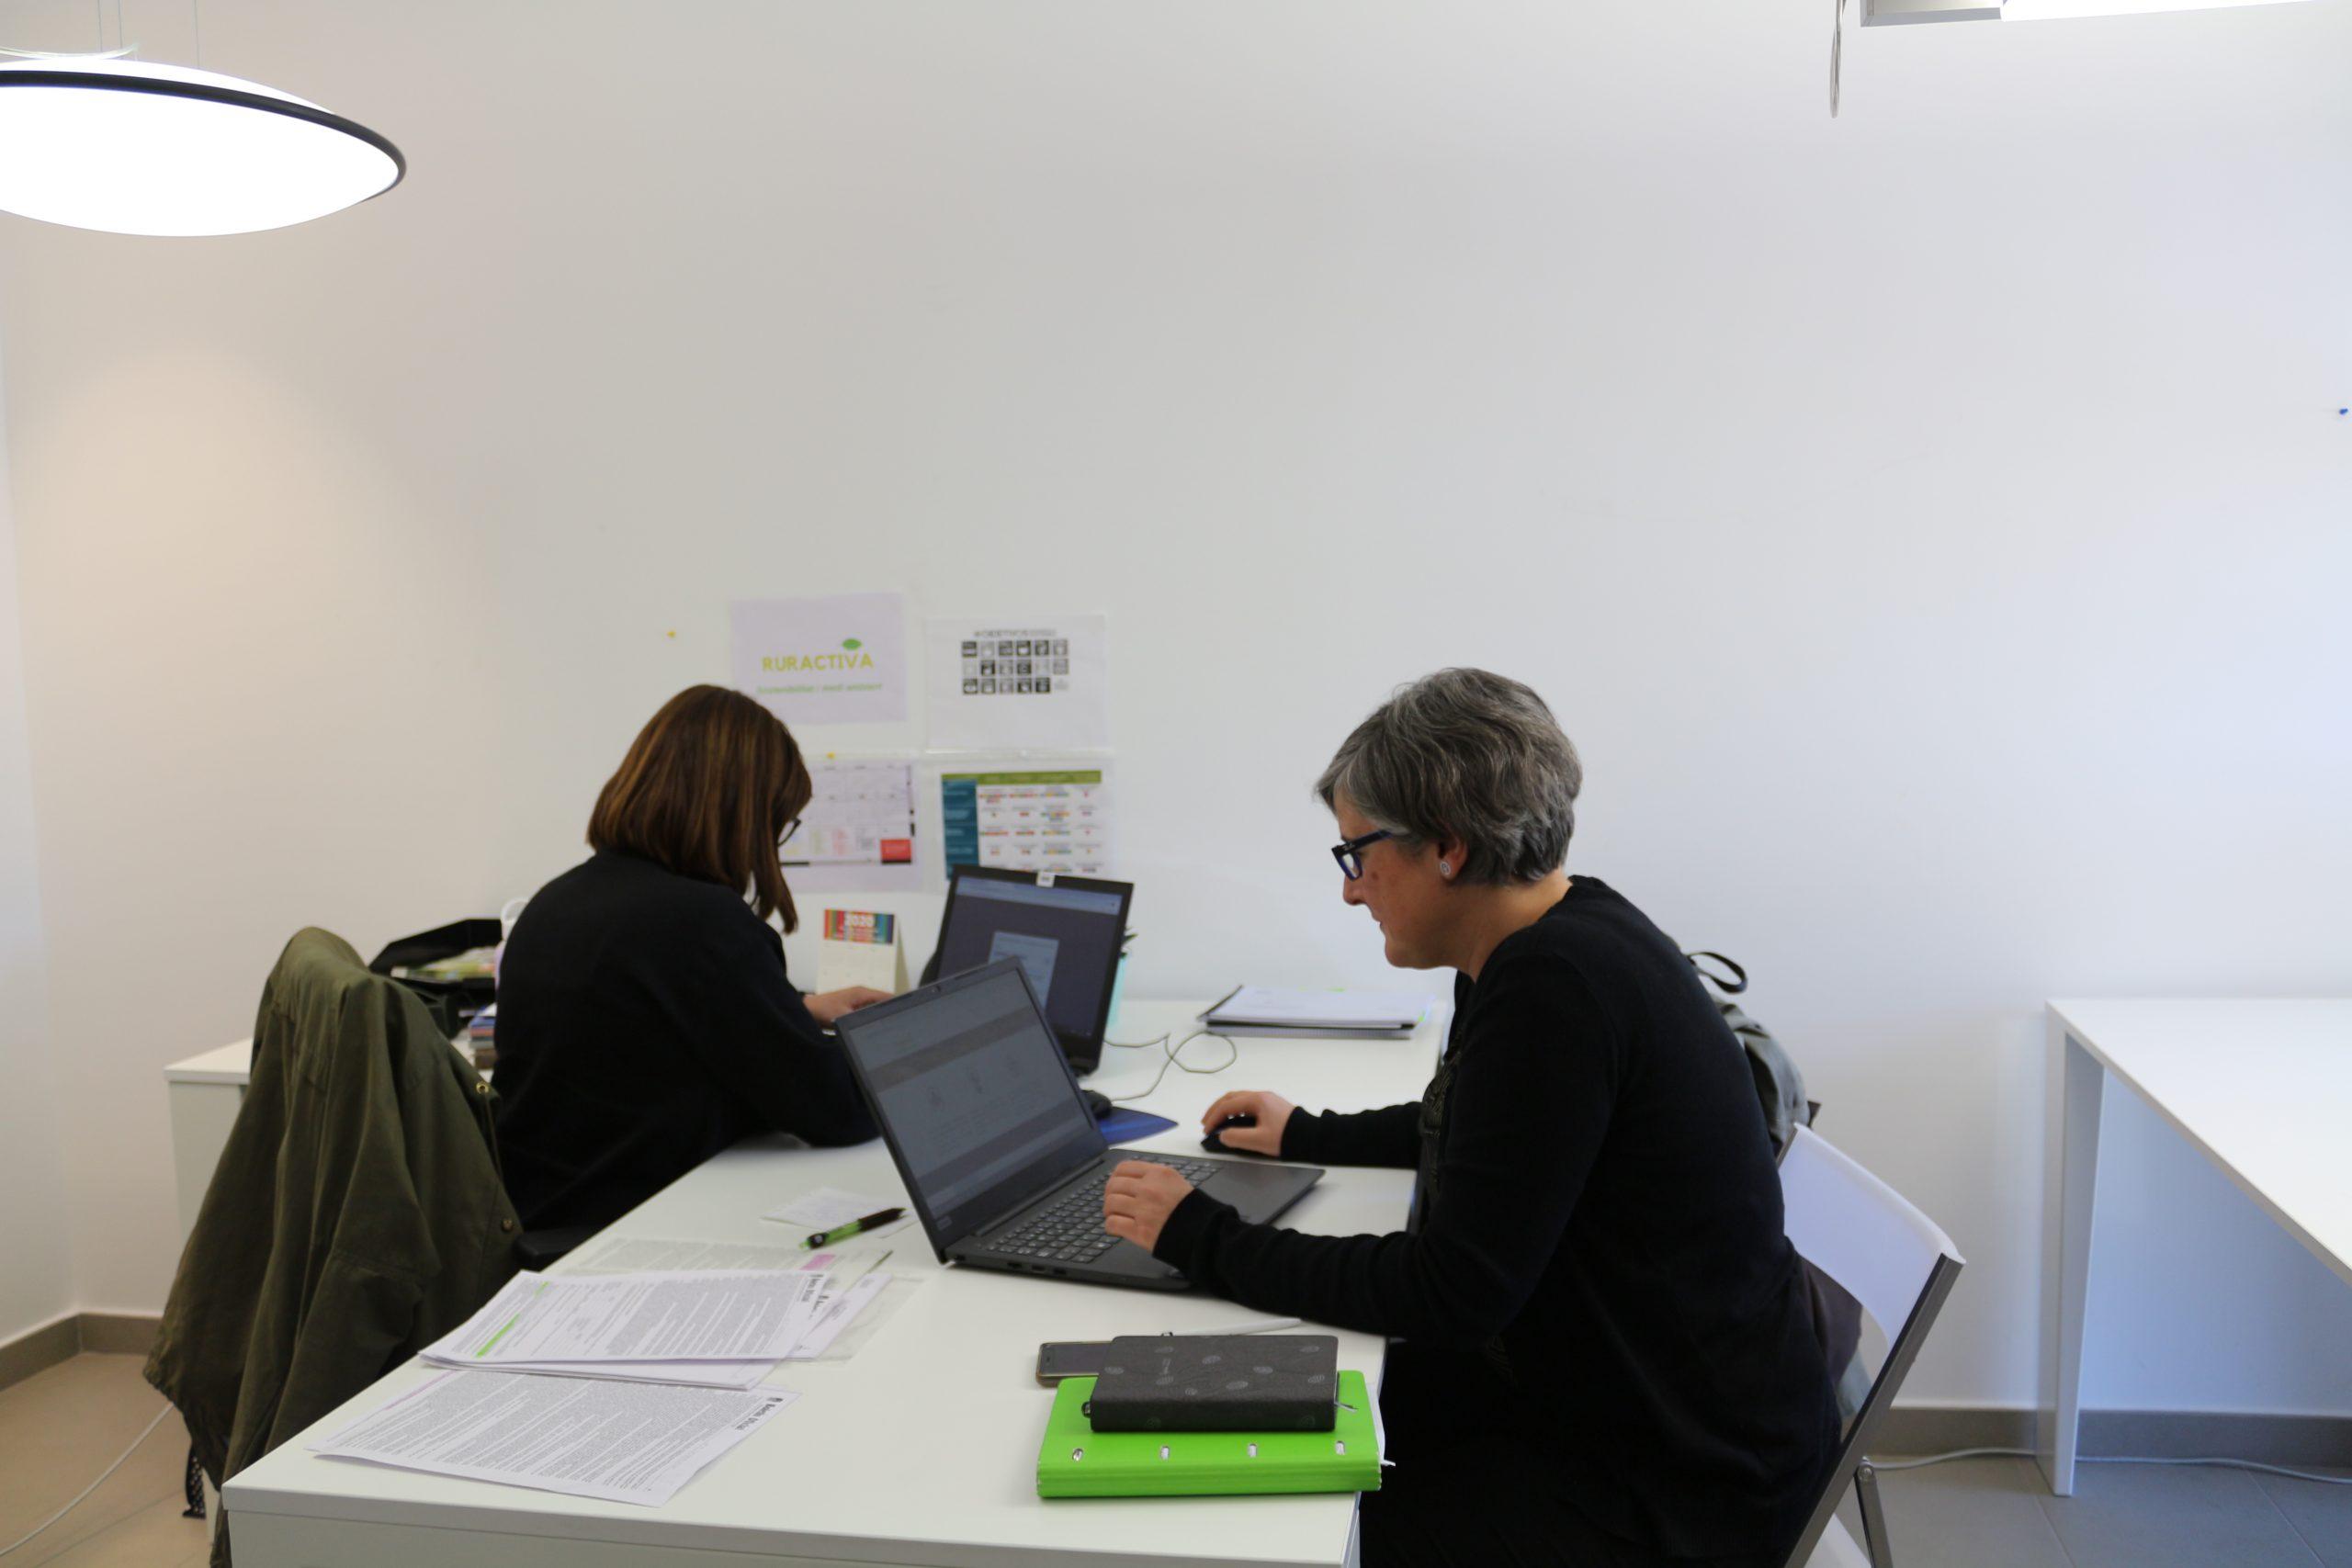 Diputación de Castellón invertirá 120.000 euros en la creación de espacios coworking en municipios de menos de 5.000 habitantes